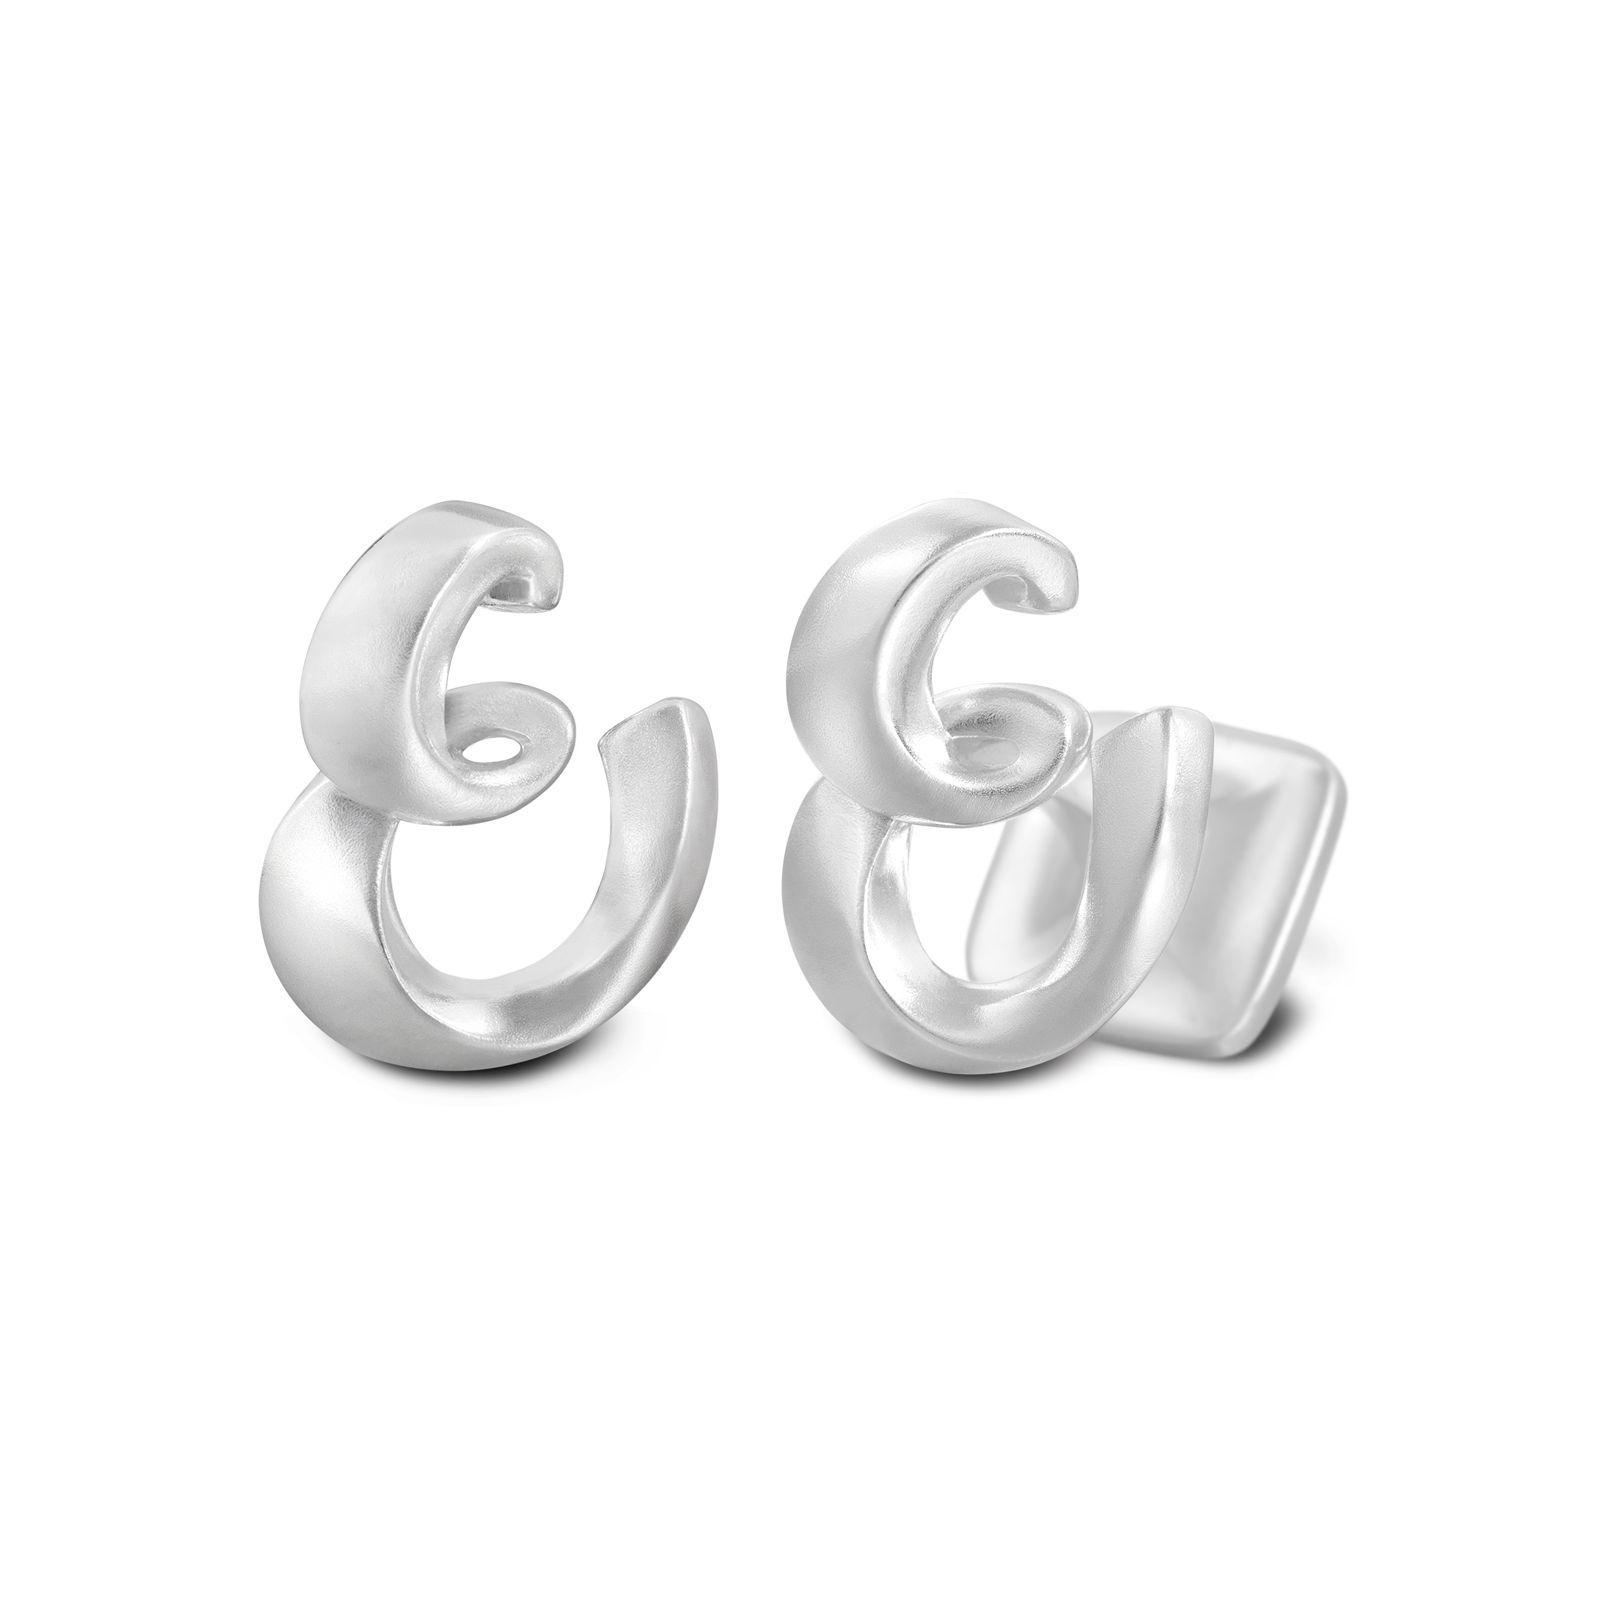 Signature Sterling Silver Cuff Link In Mist Finish Letter E